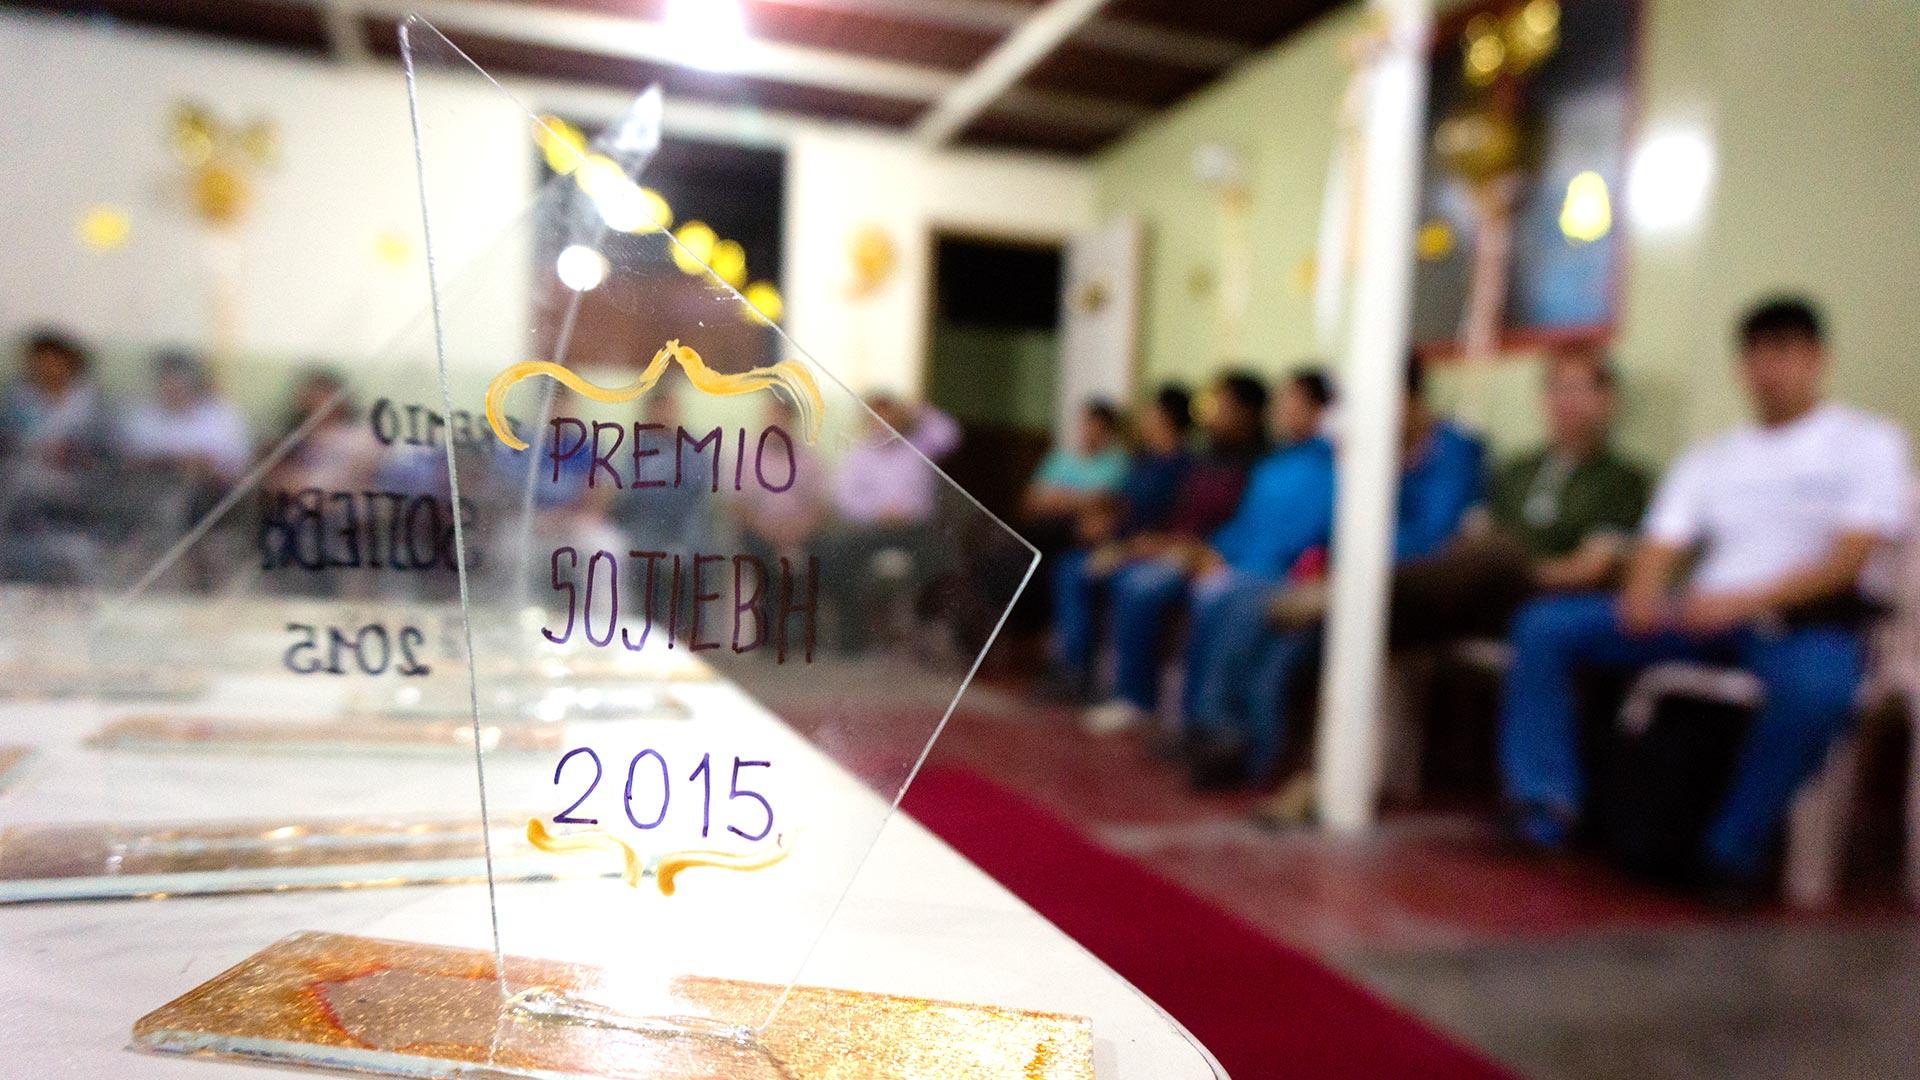 premio-sojiebh-2015